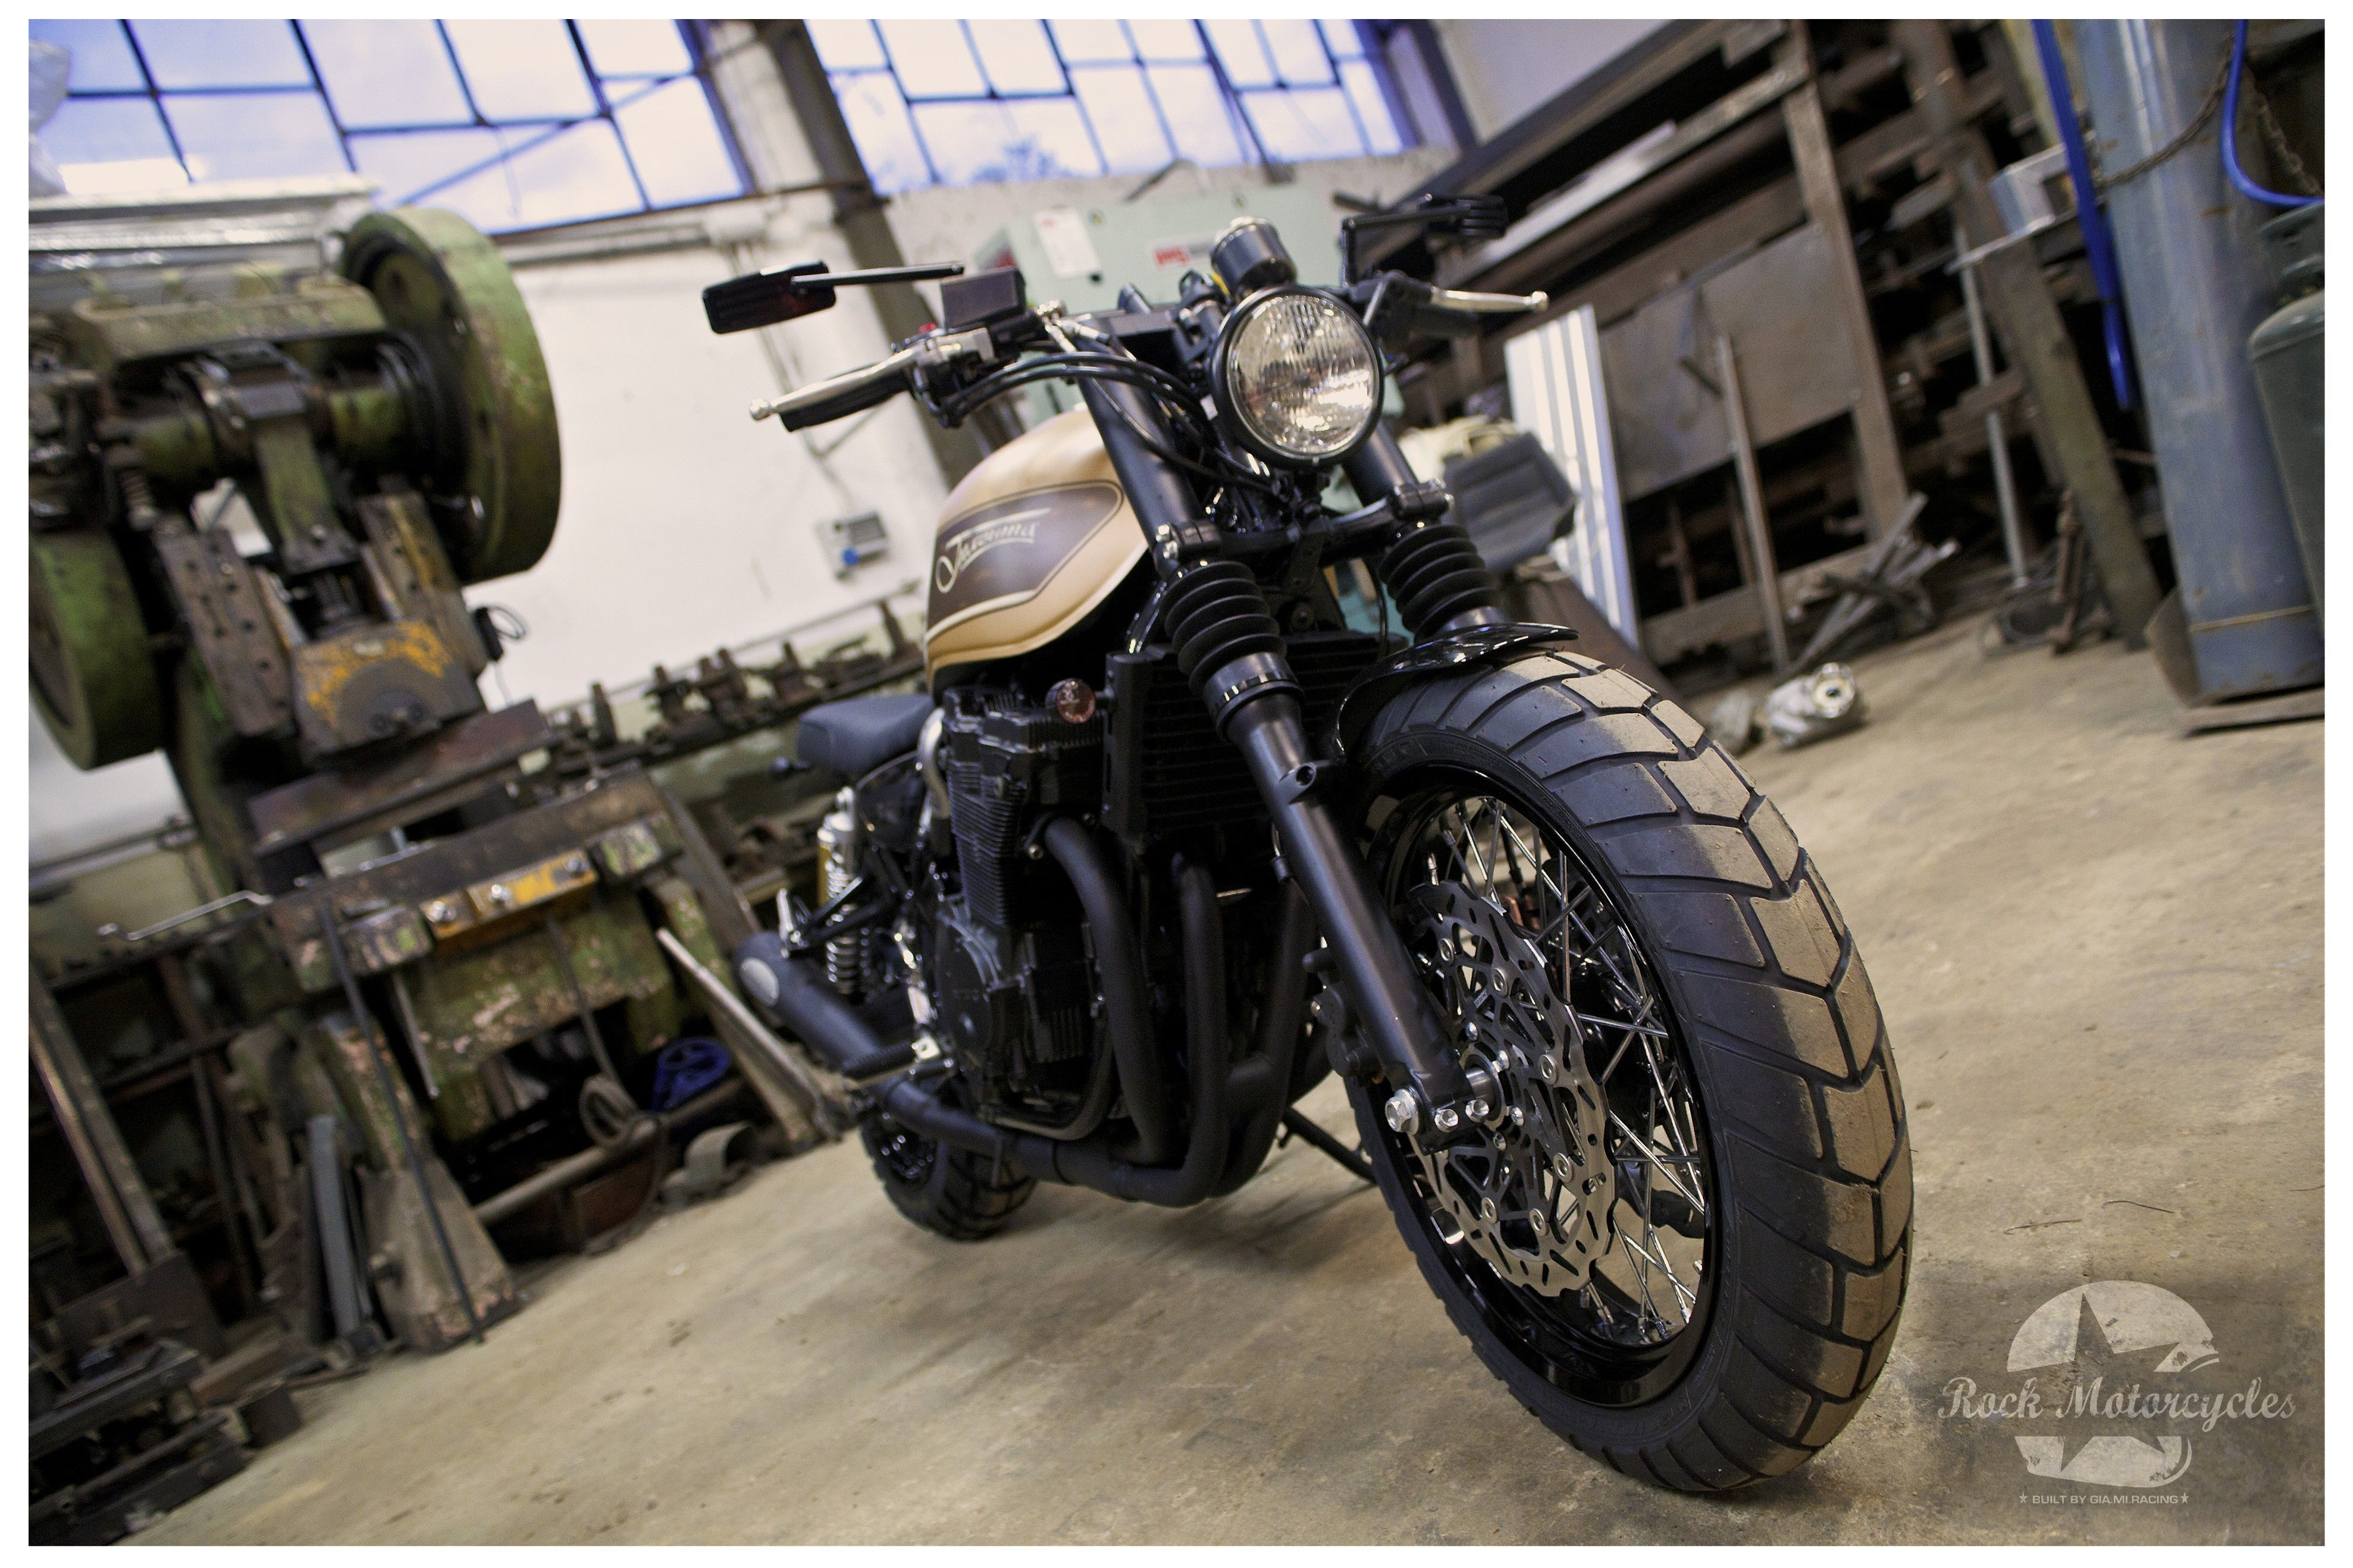 Scrambler Motorcycle Suzuki 3955 x 2636 · 2321 kB · jpeg